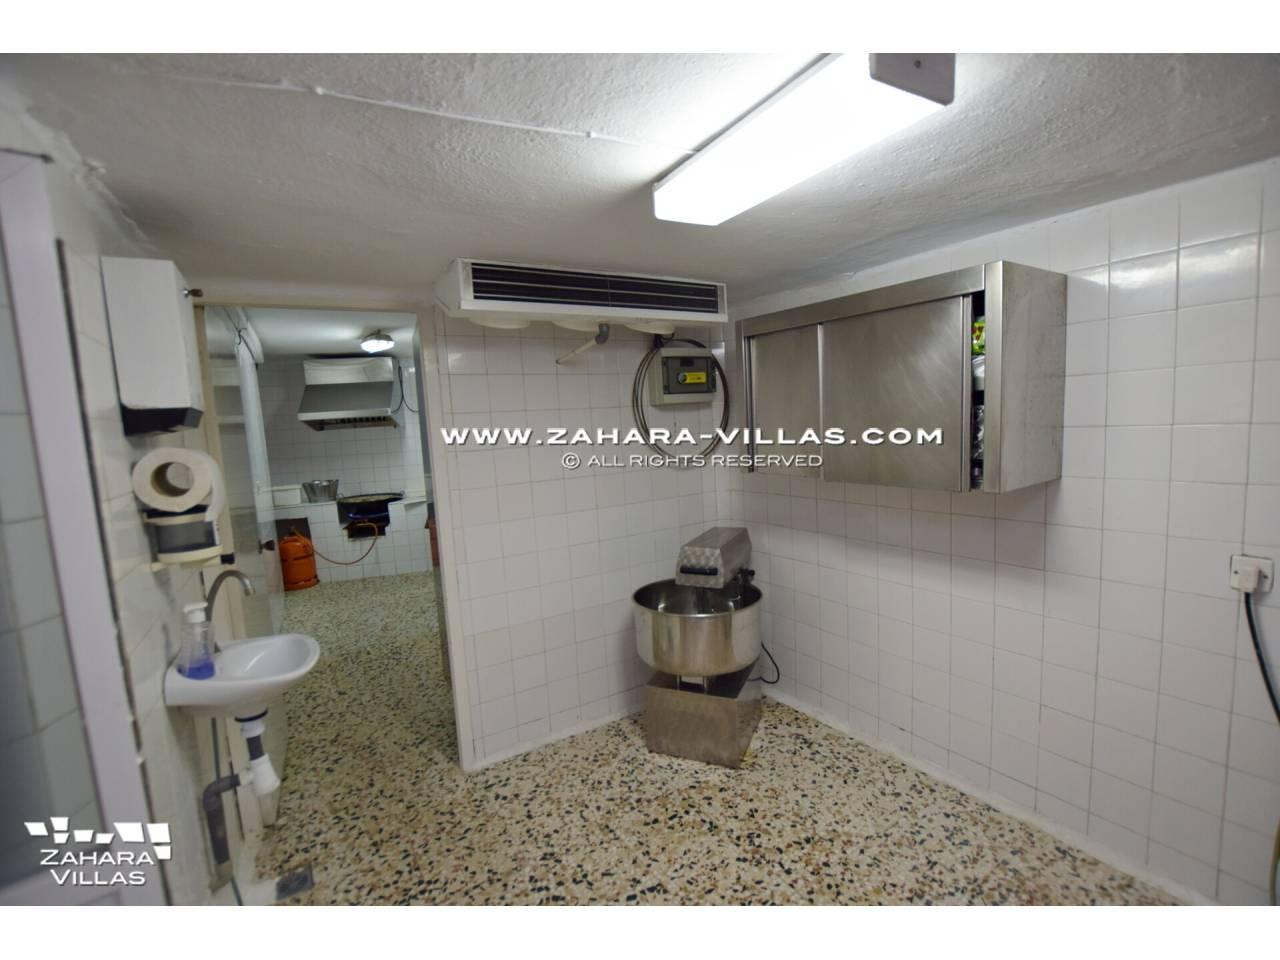 Imagen 20 de House for sale located in pedestrian street of Vejer de la Frontera